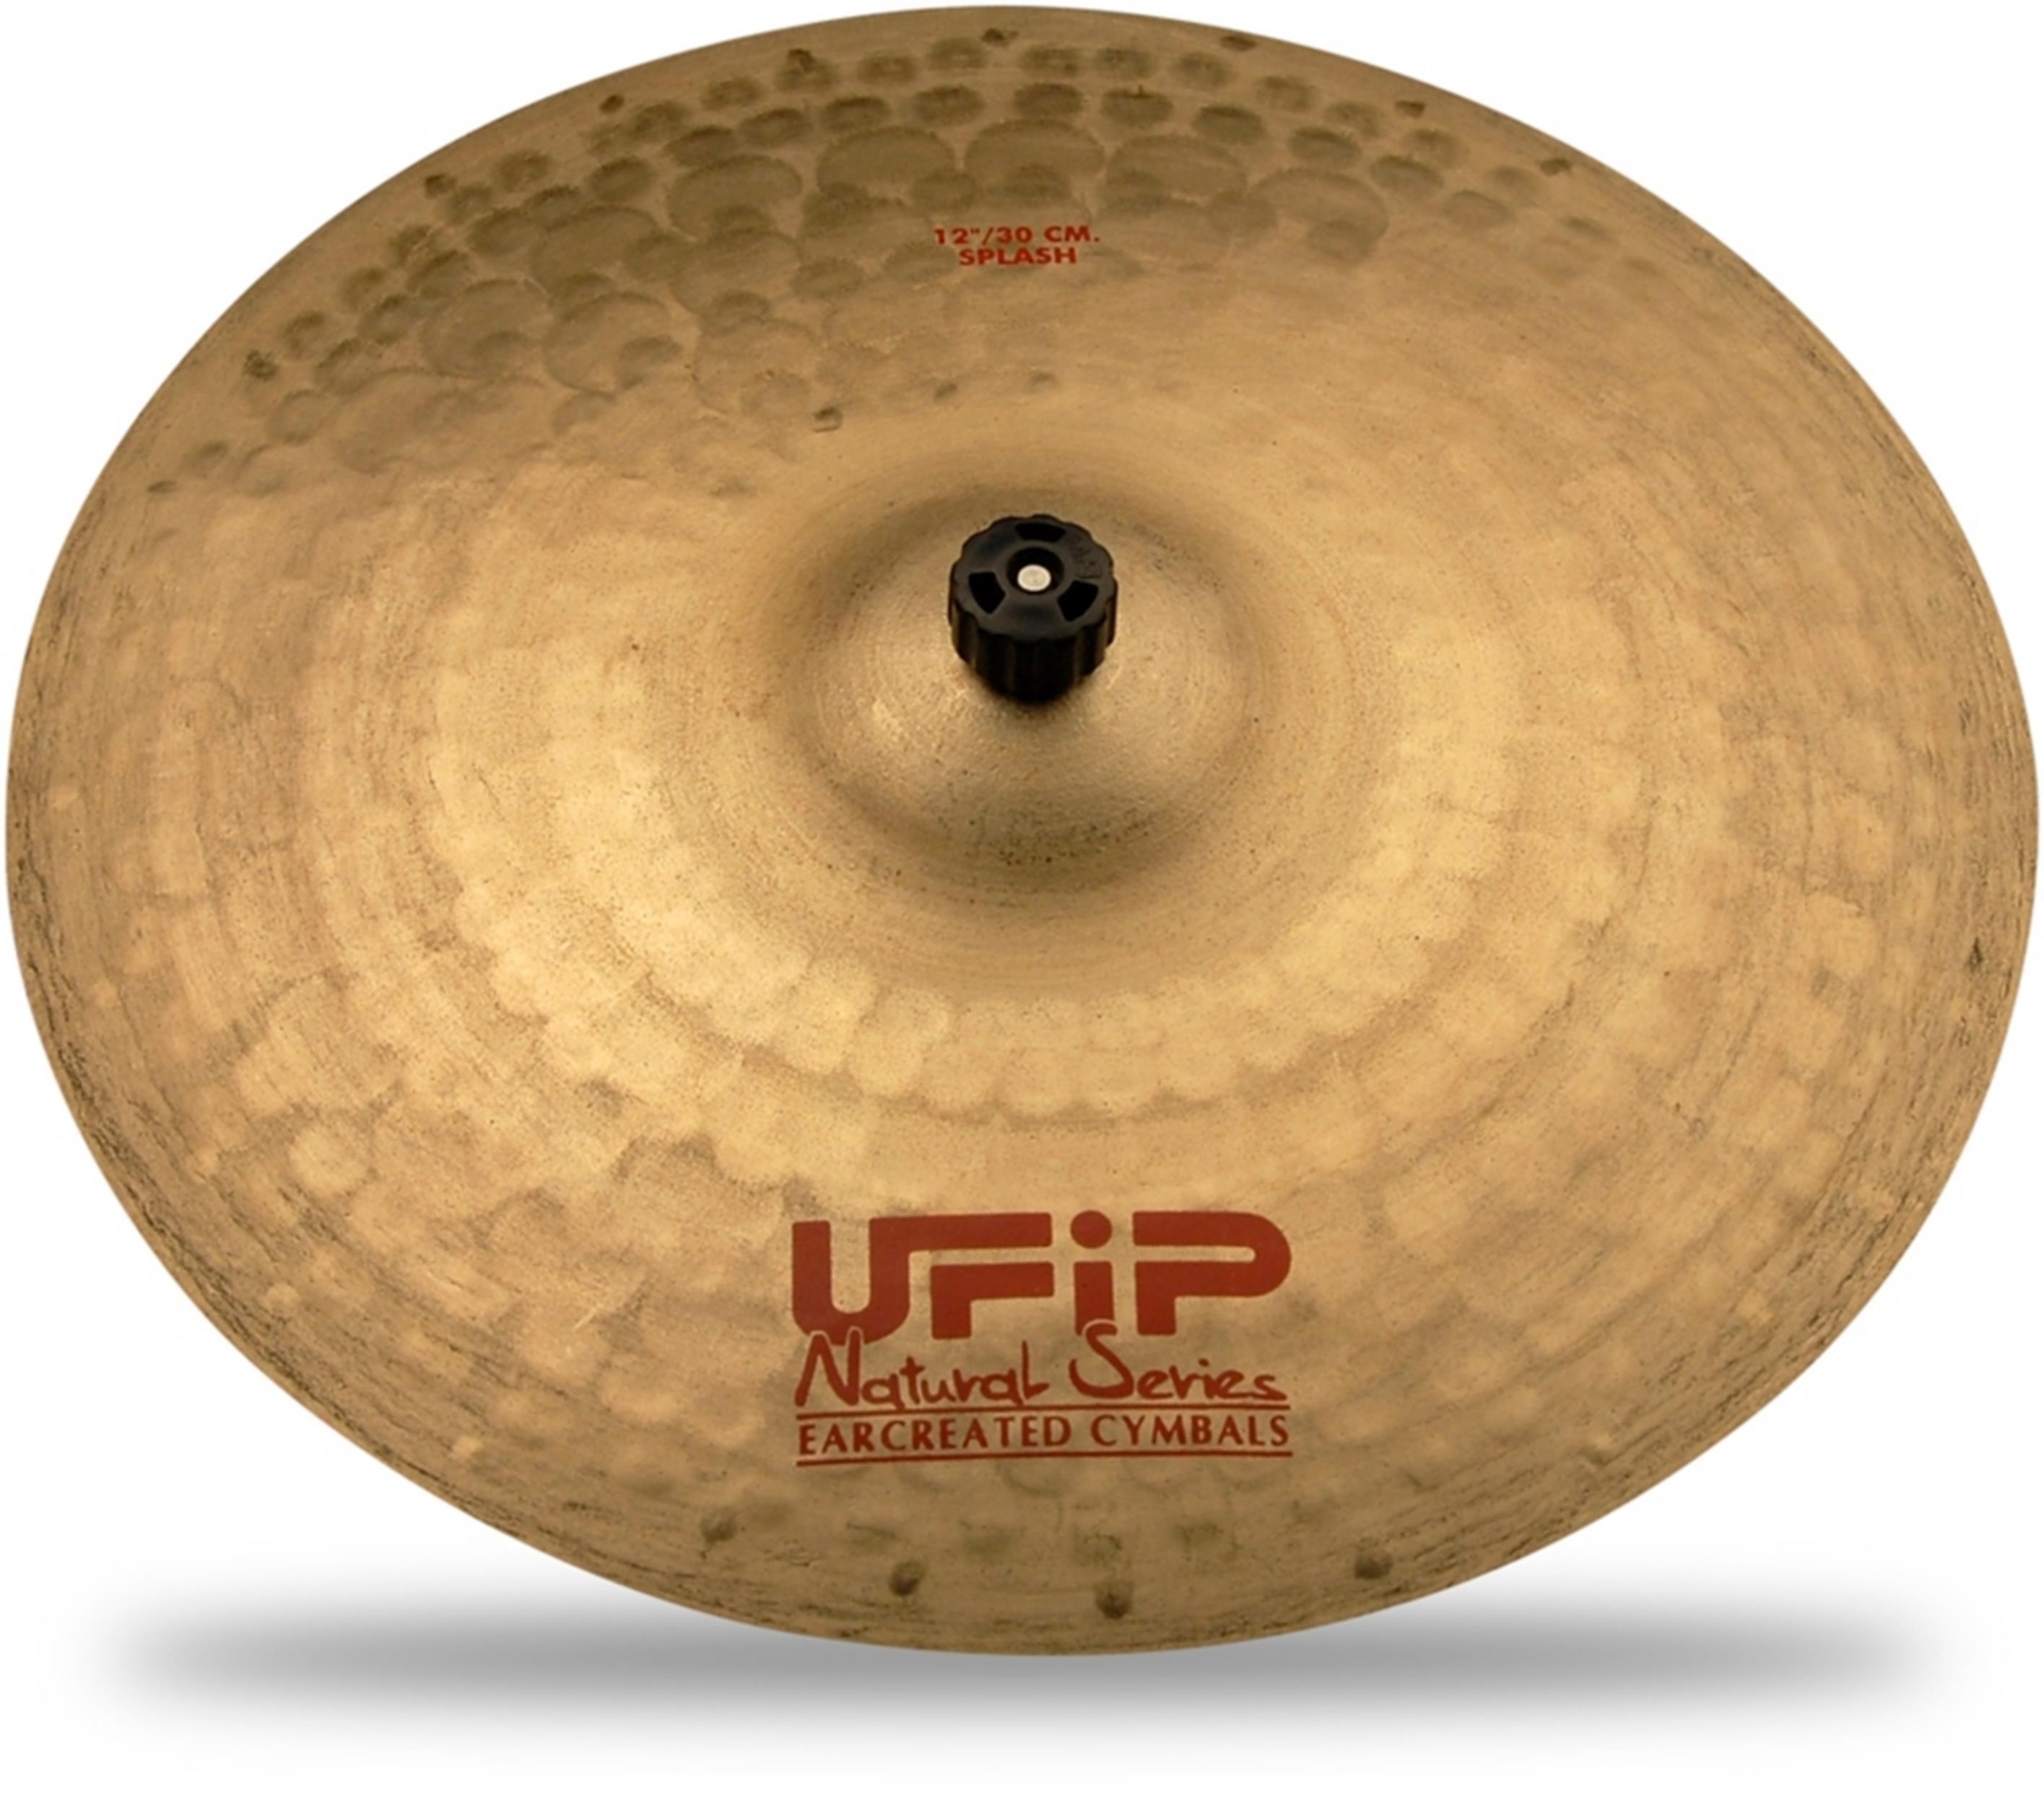 UFIP-NS-12-Natural-Series-12-Splash-sku-18061